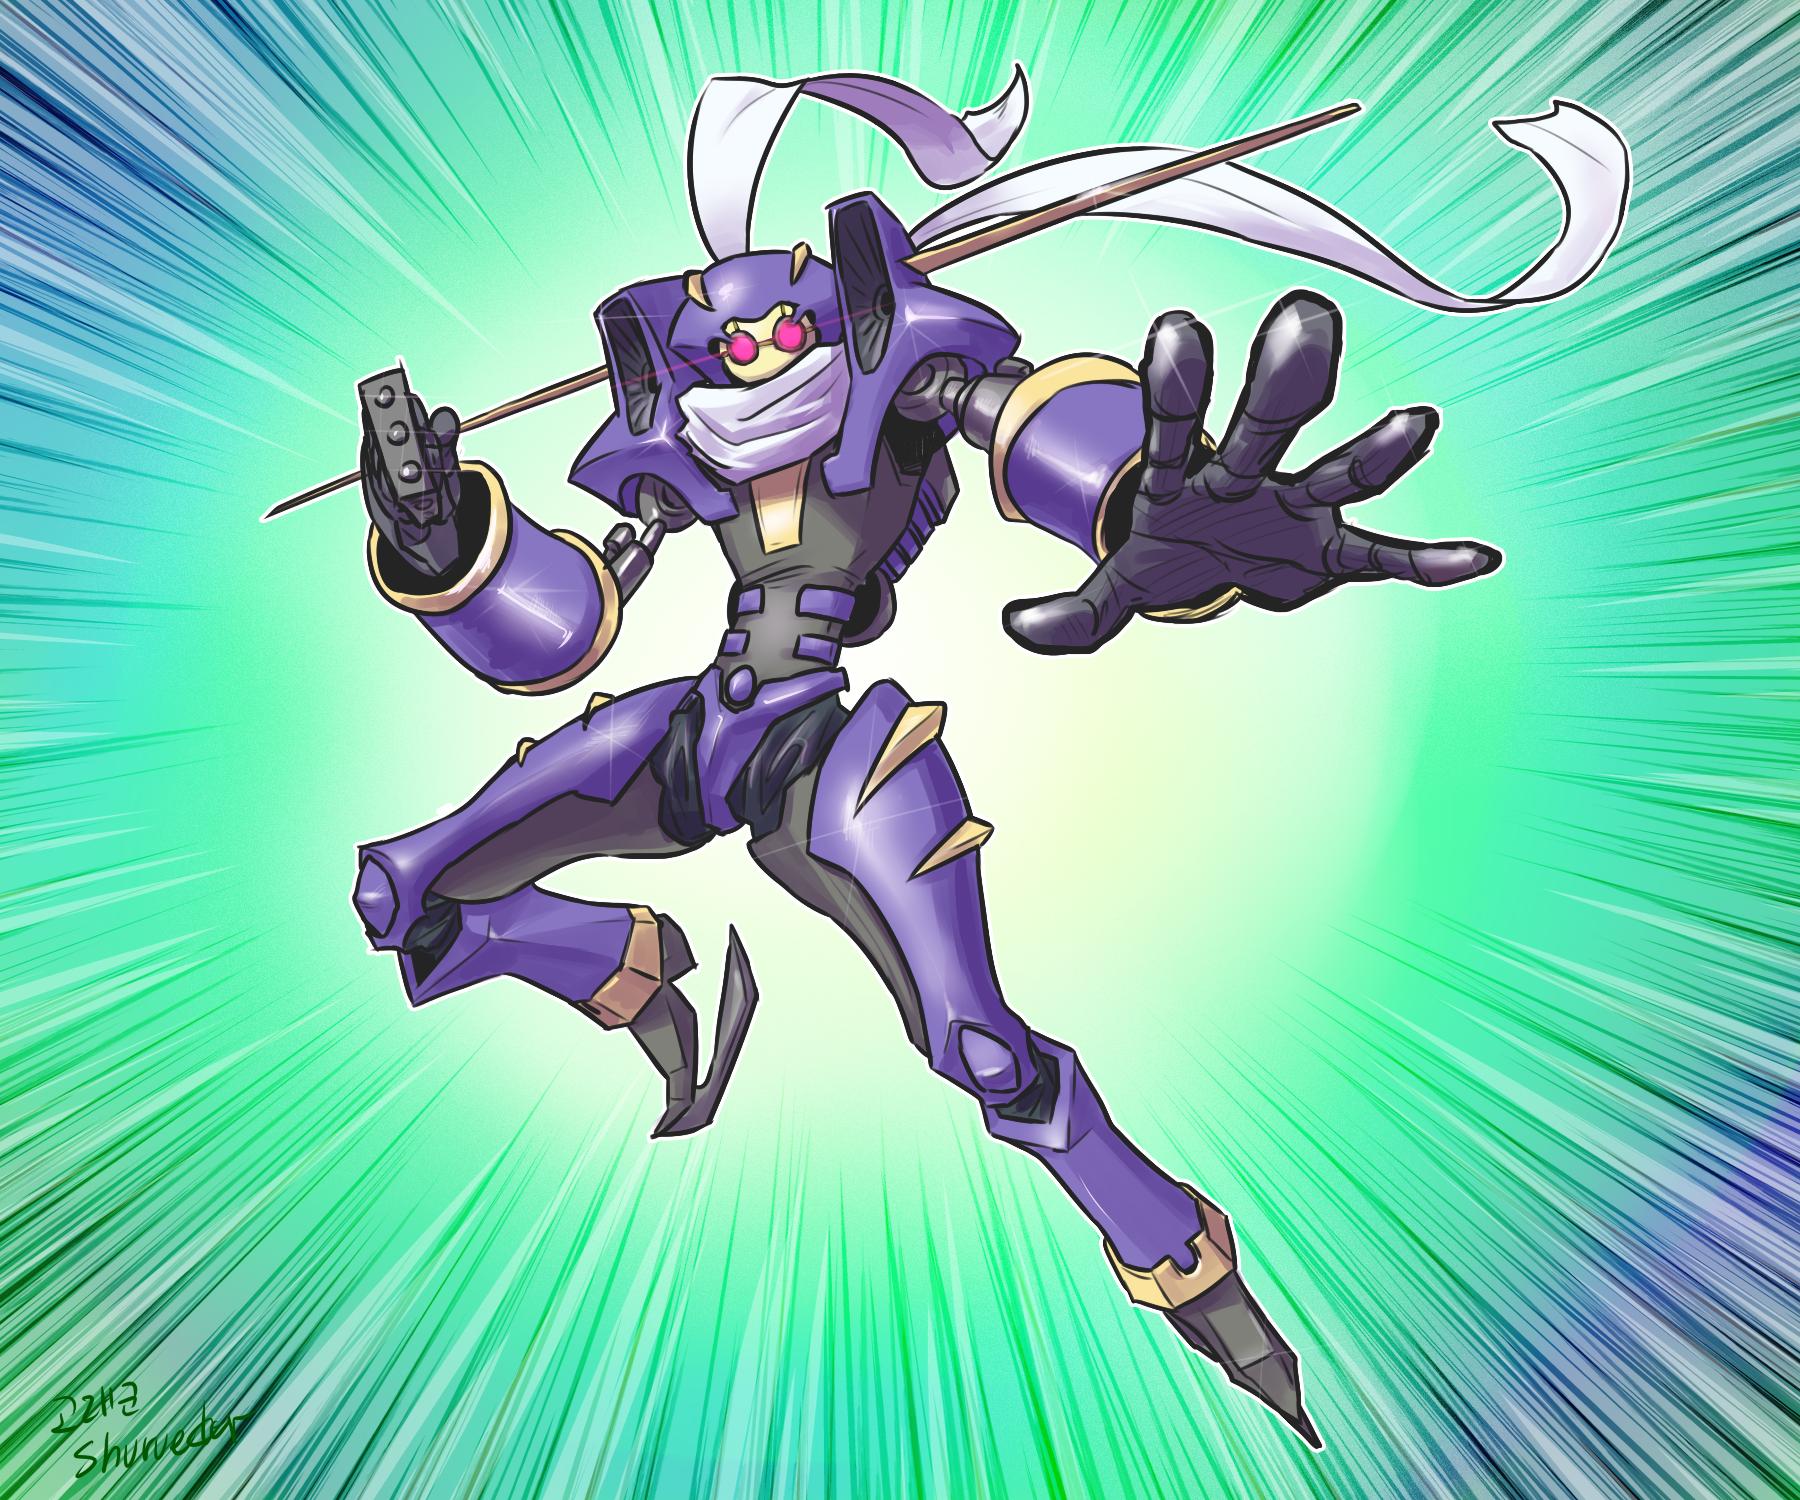 Junk Warrior Yu Gi Oh 5d S Zerochan Anime Image Board